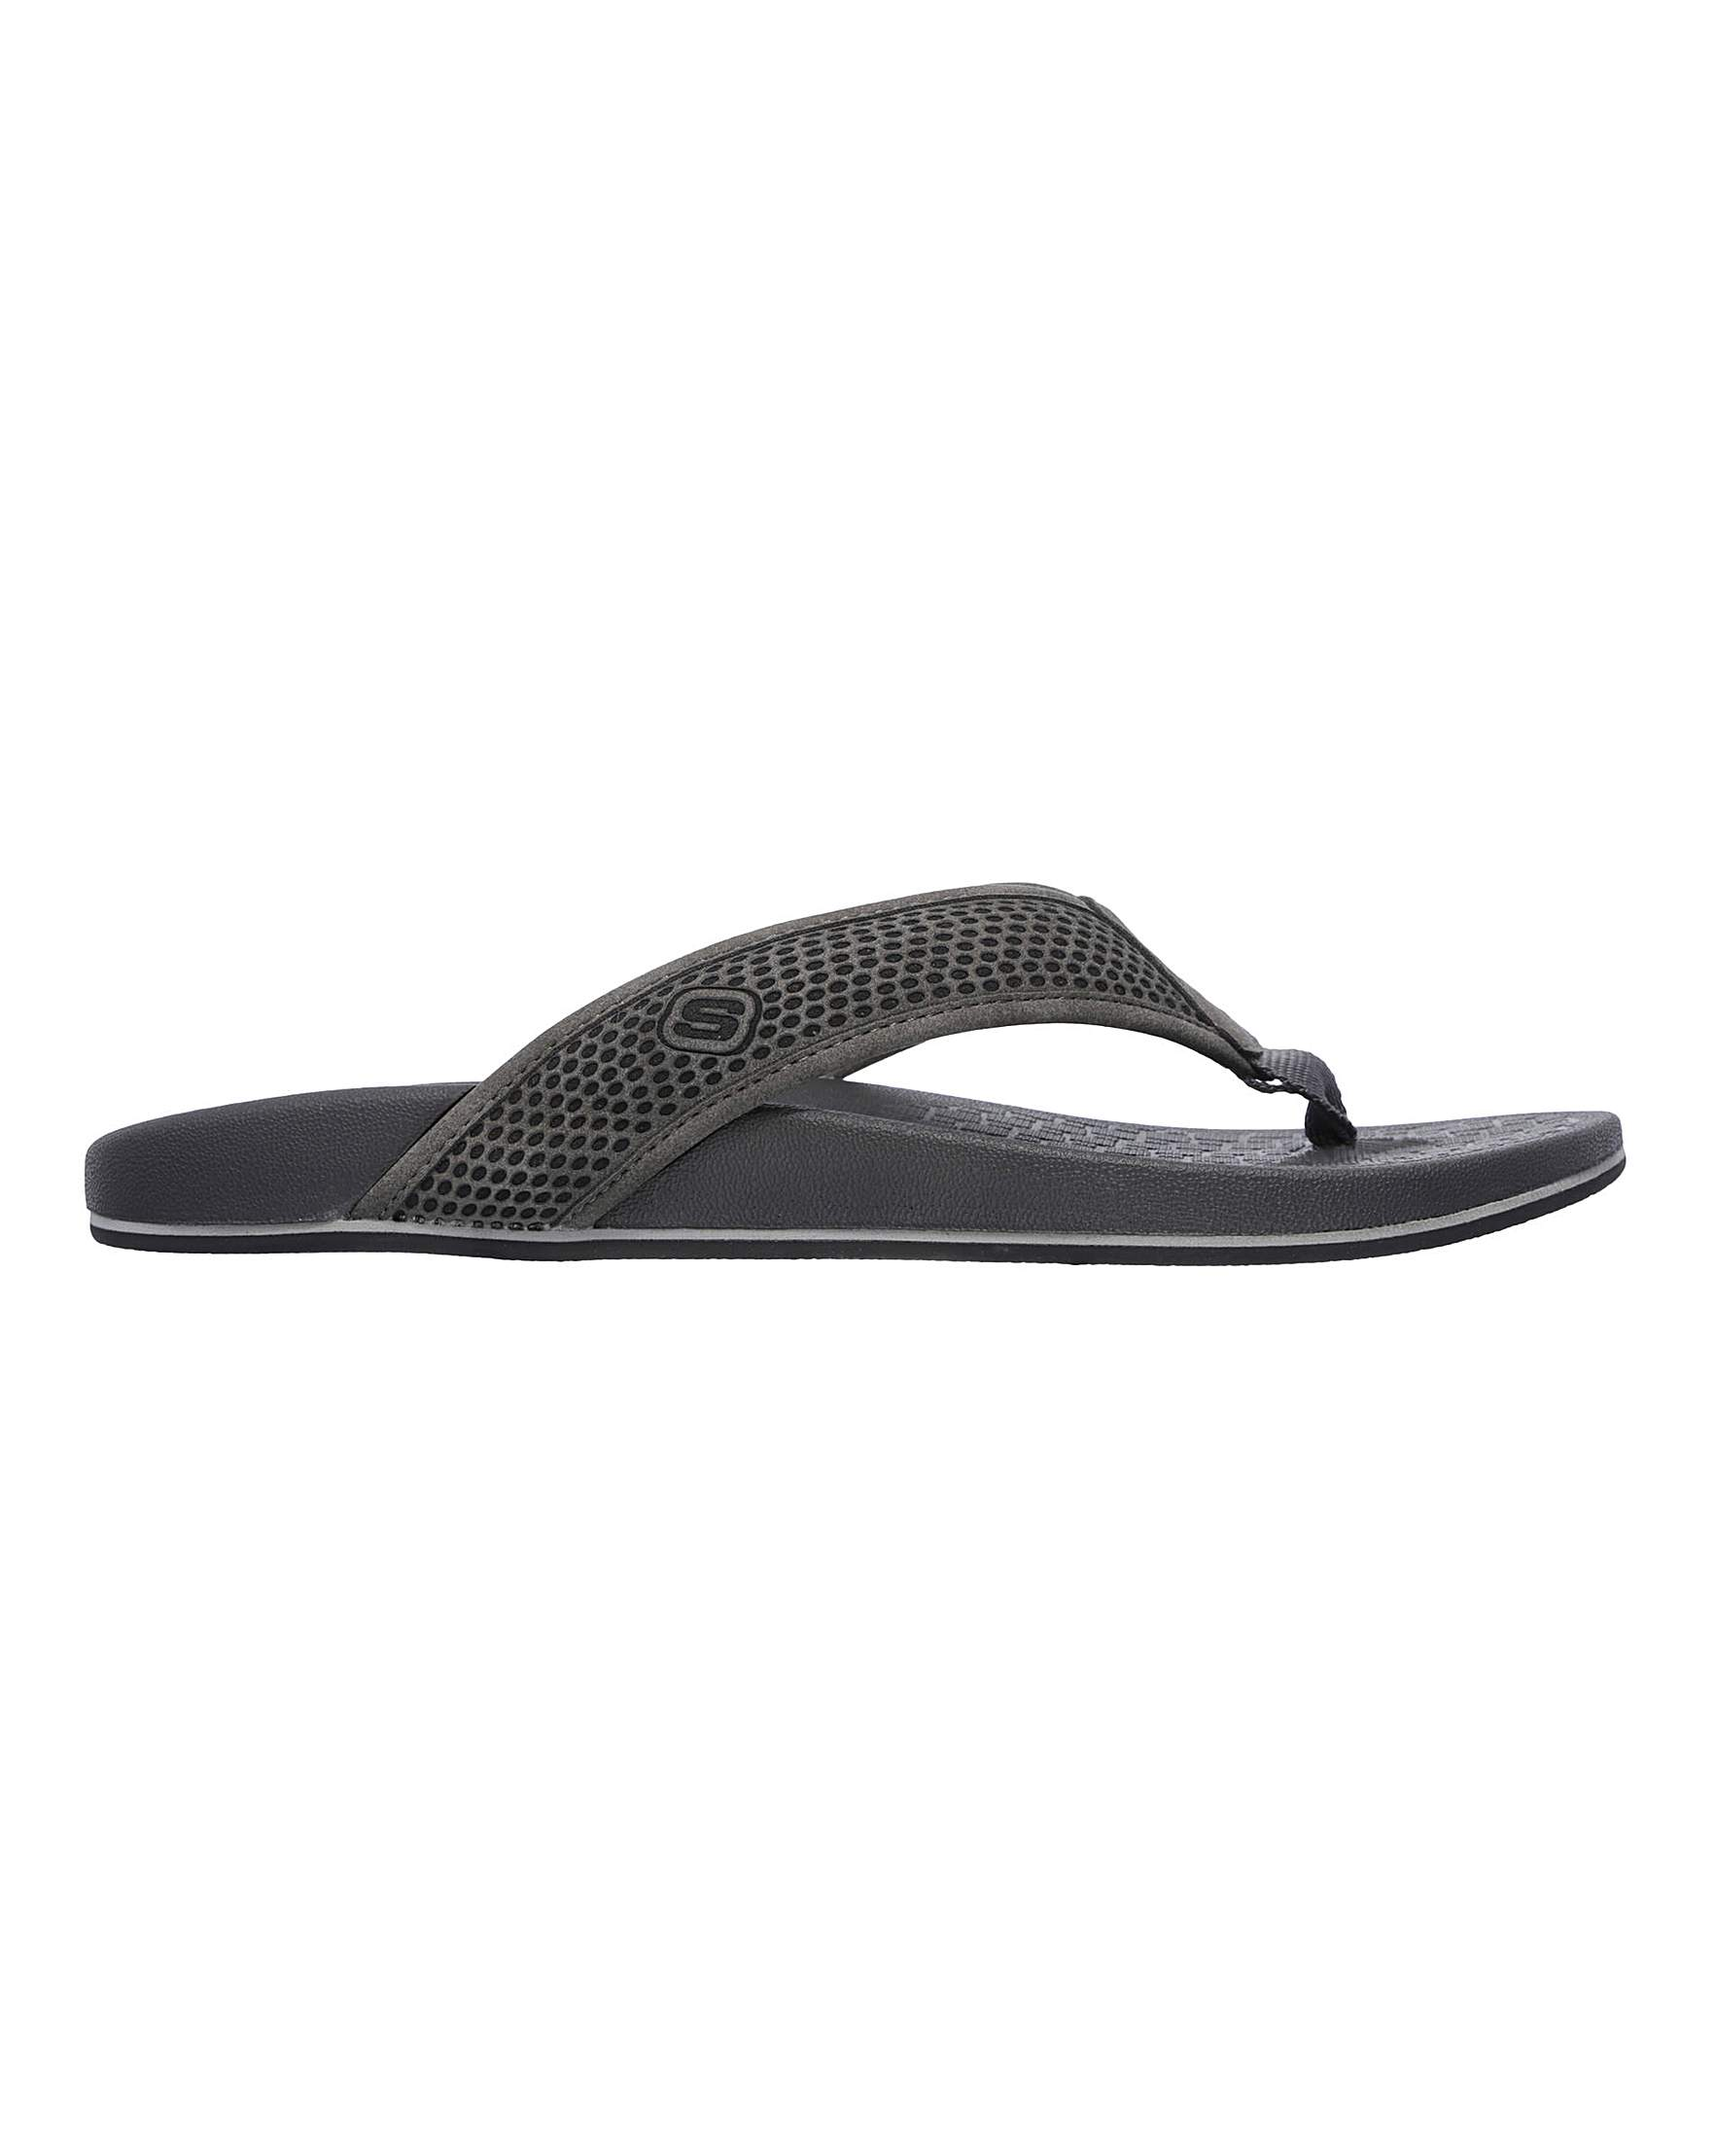 1acc9999d70b Skechers Pelem Emiro Toe Post Sandals